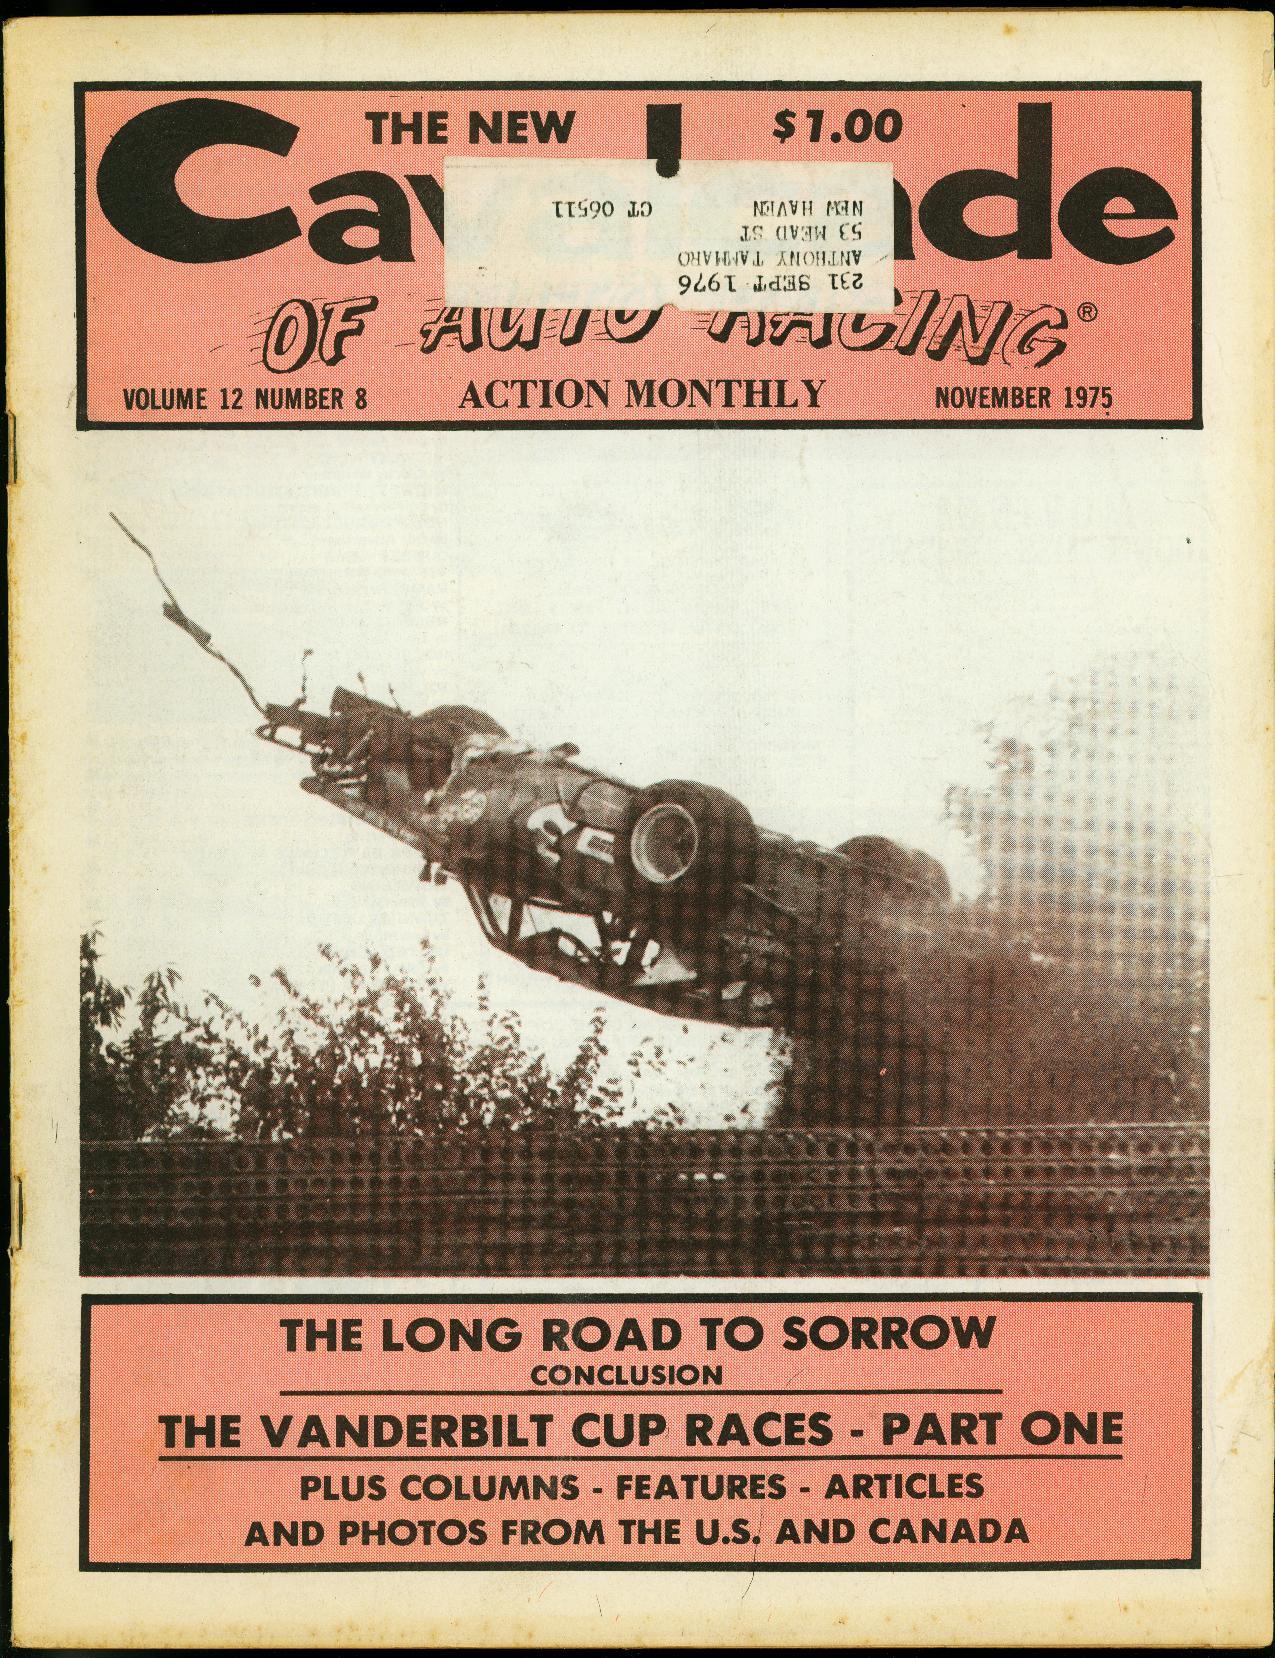 Cavalcade of Auto Racing November 1975- Vanderbuilt Cup- CRA Sprint Very Good